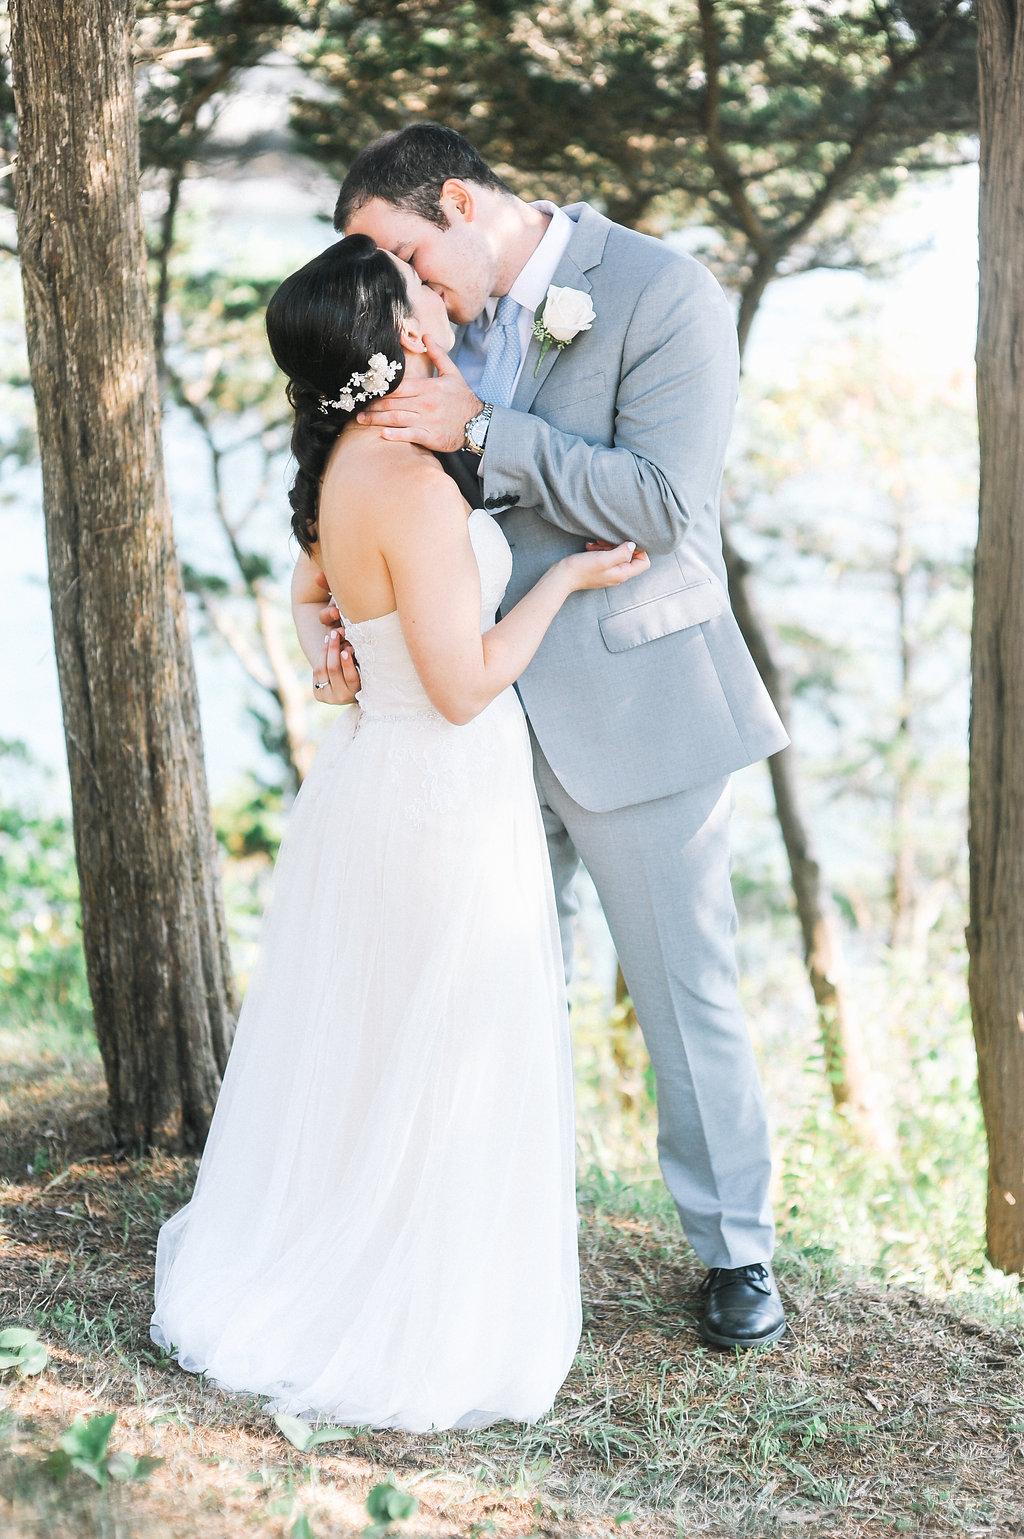 BrideGroomPortraits_Dragonline_Studios_Jamestown_RI_Wedding-42.jpg